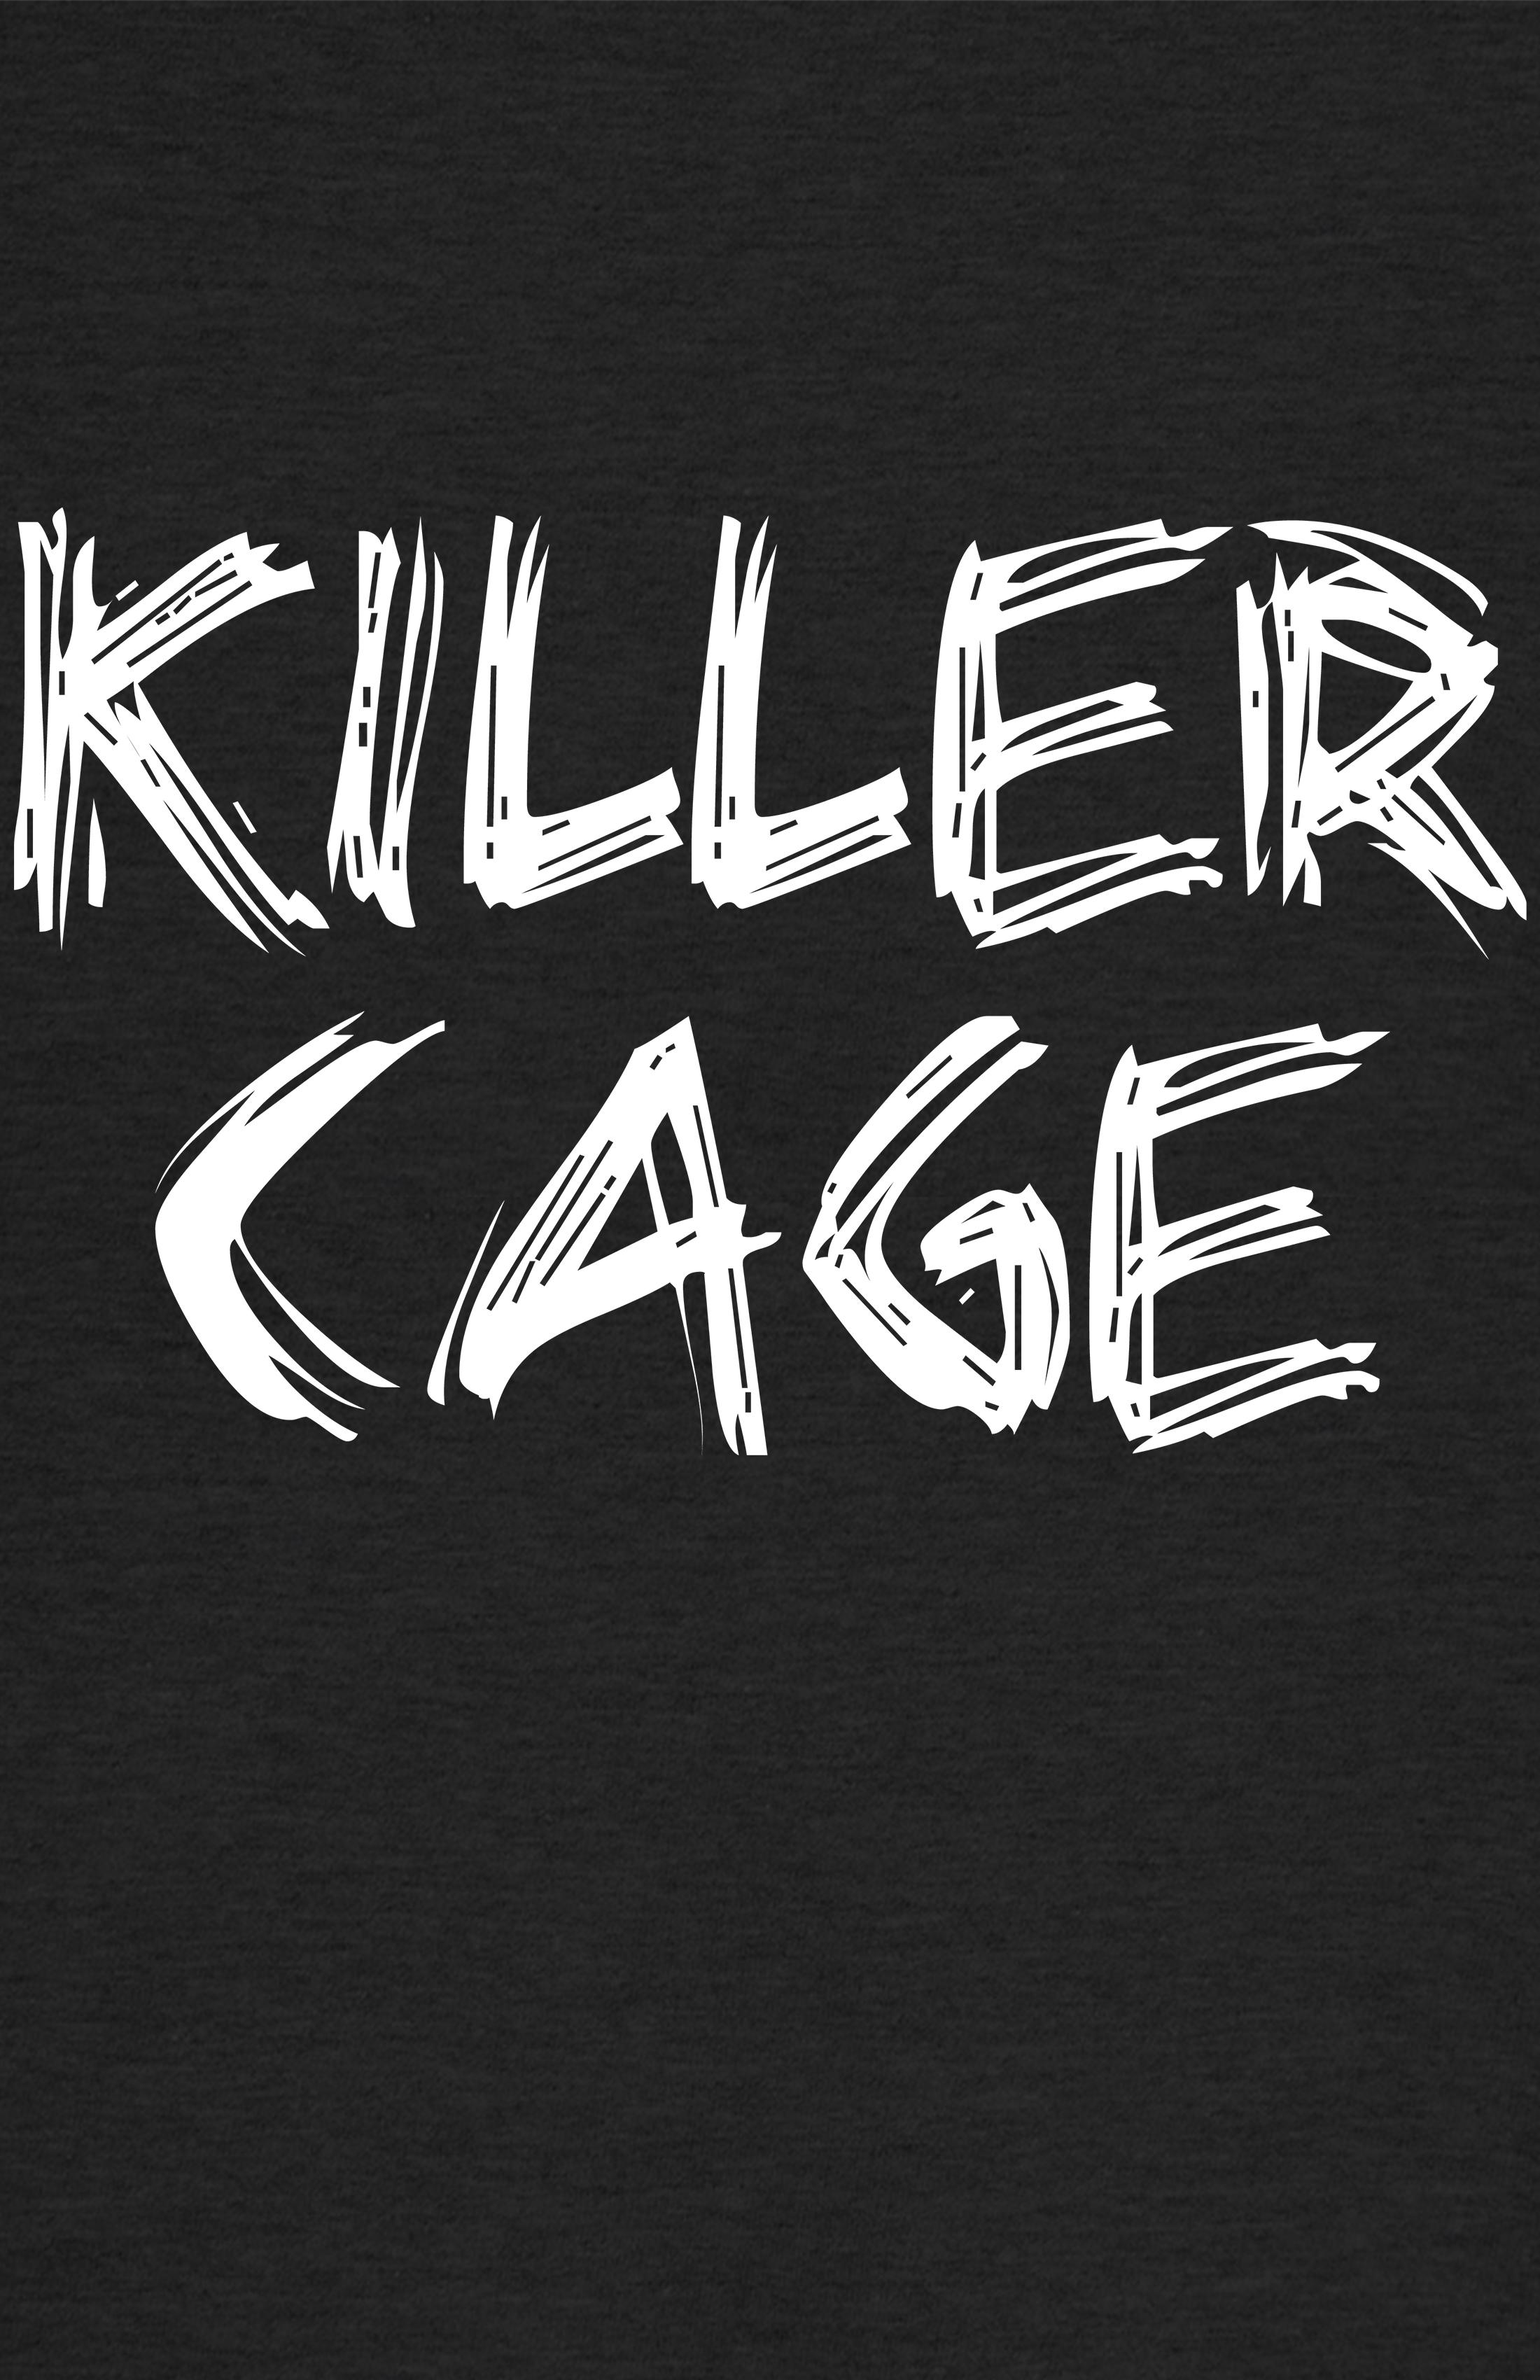 killercage.jpg